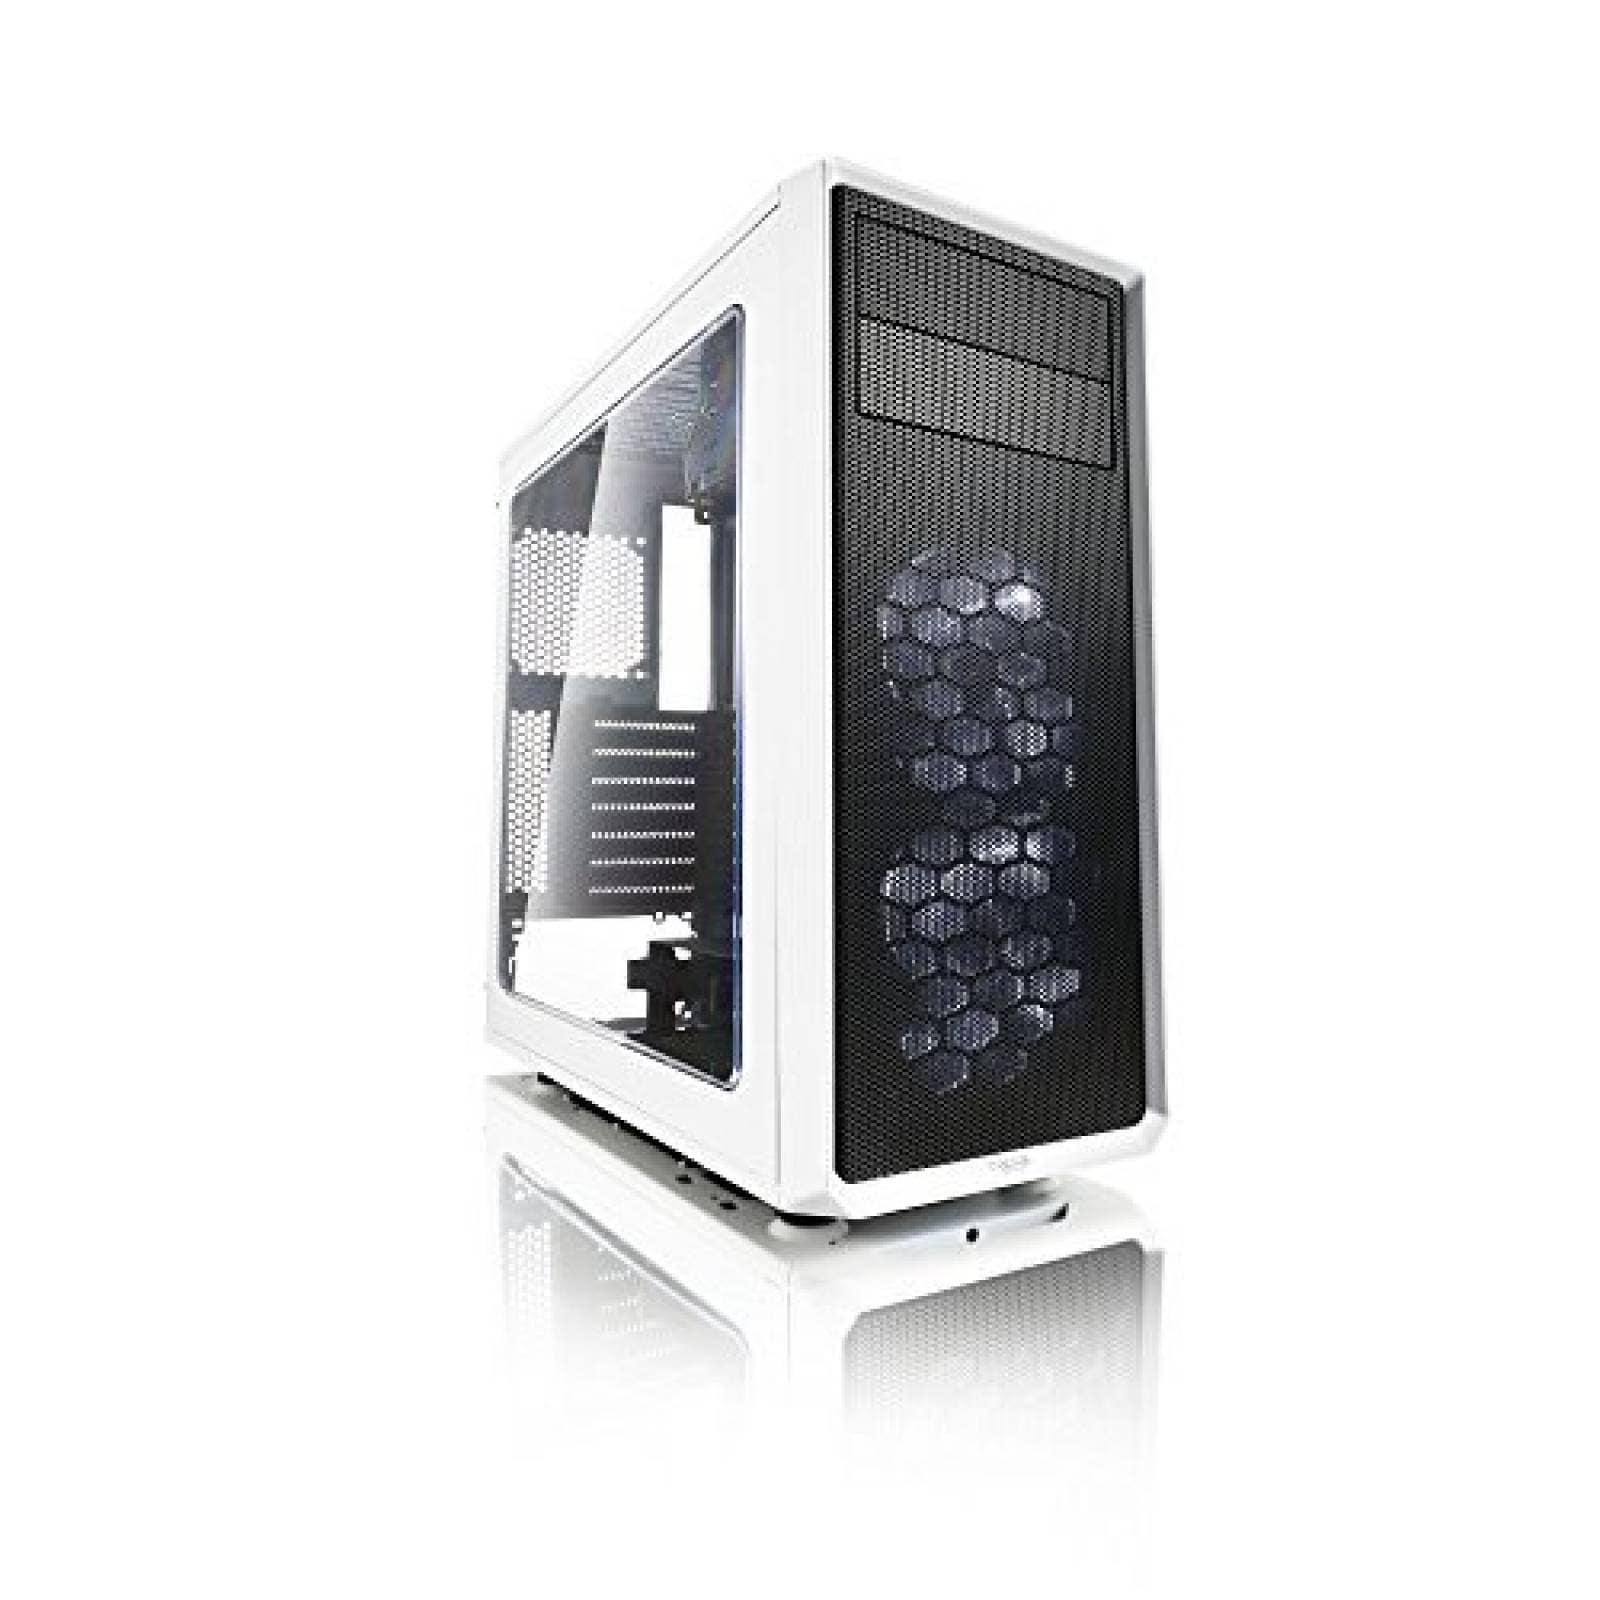 Gabinete para PC Fractal Design FD CA Focus WT W ATX -Blanco